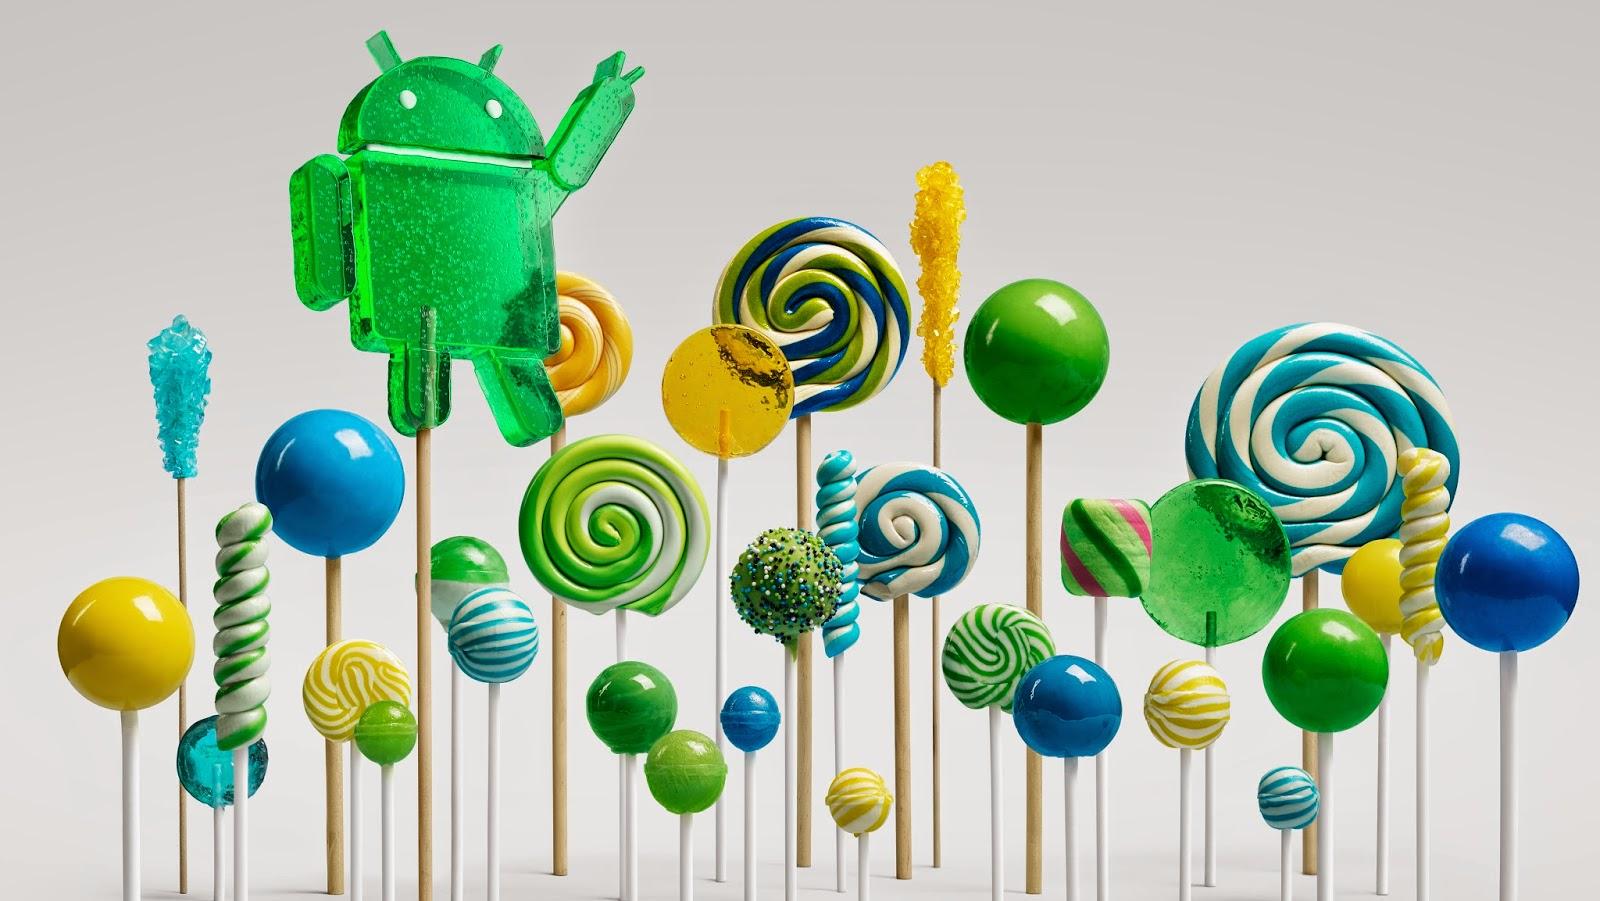 fitur unggulan android lollipop